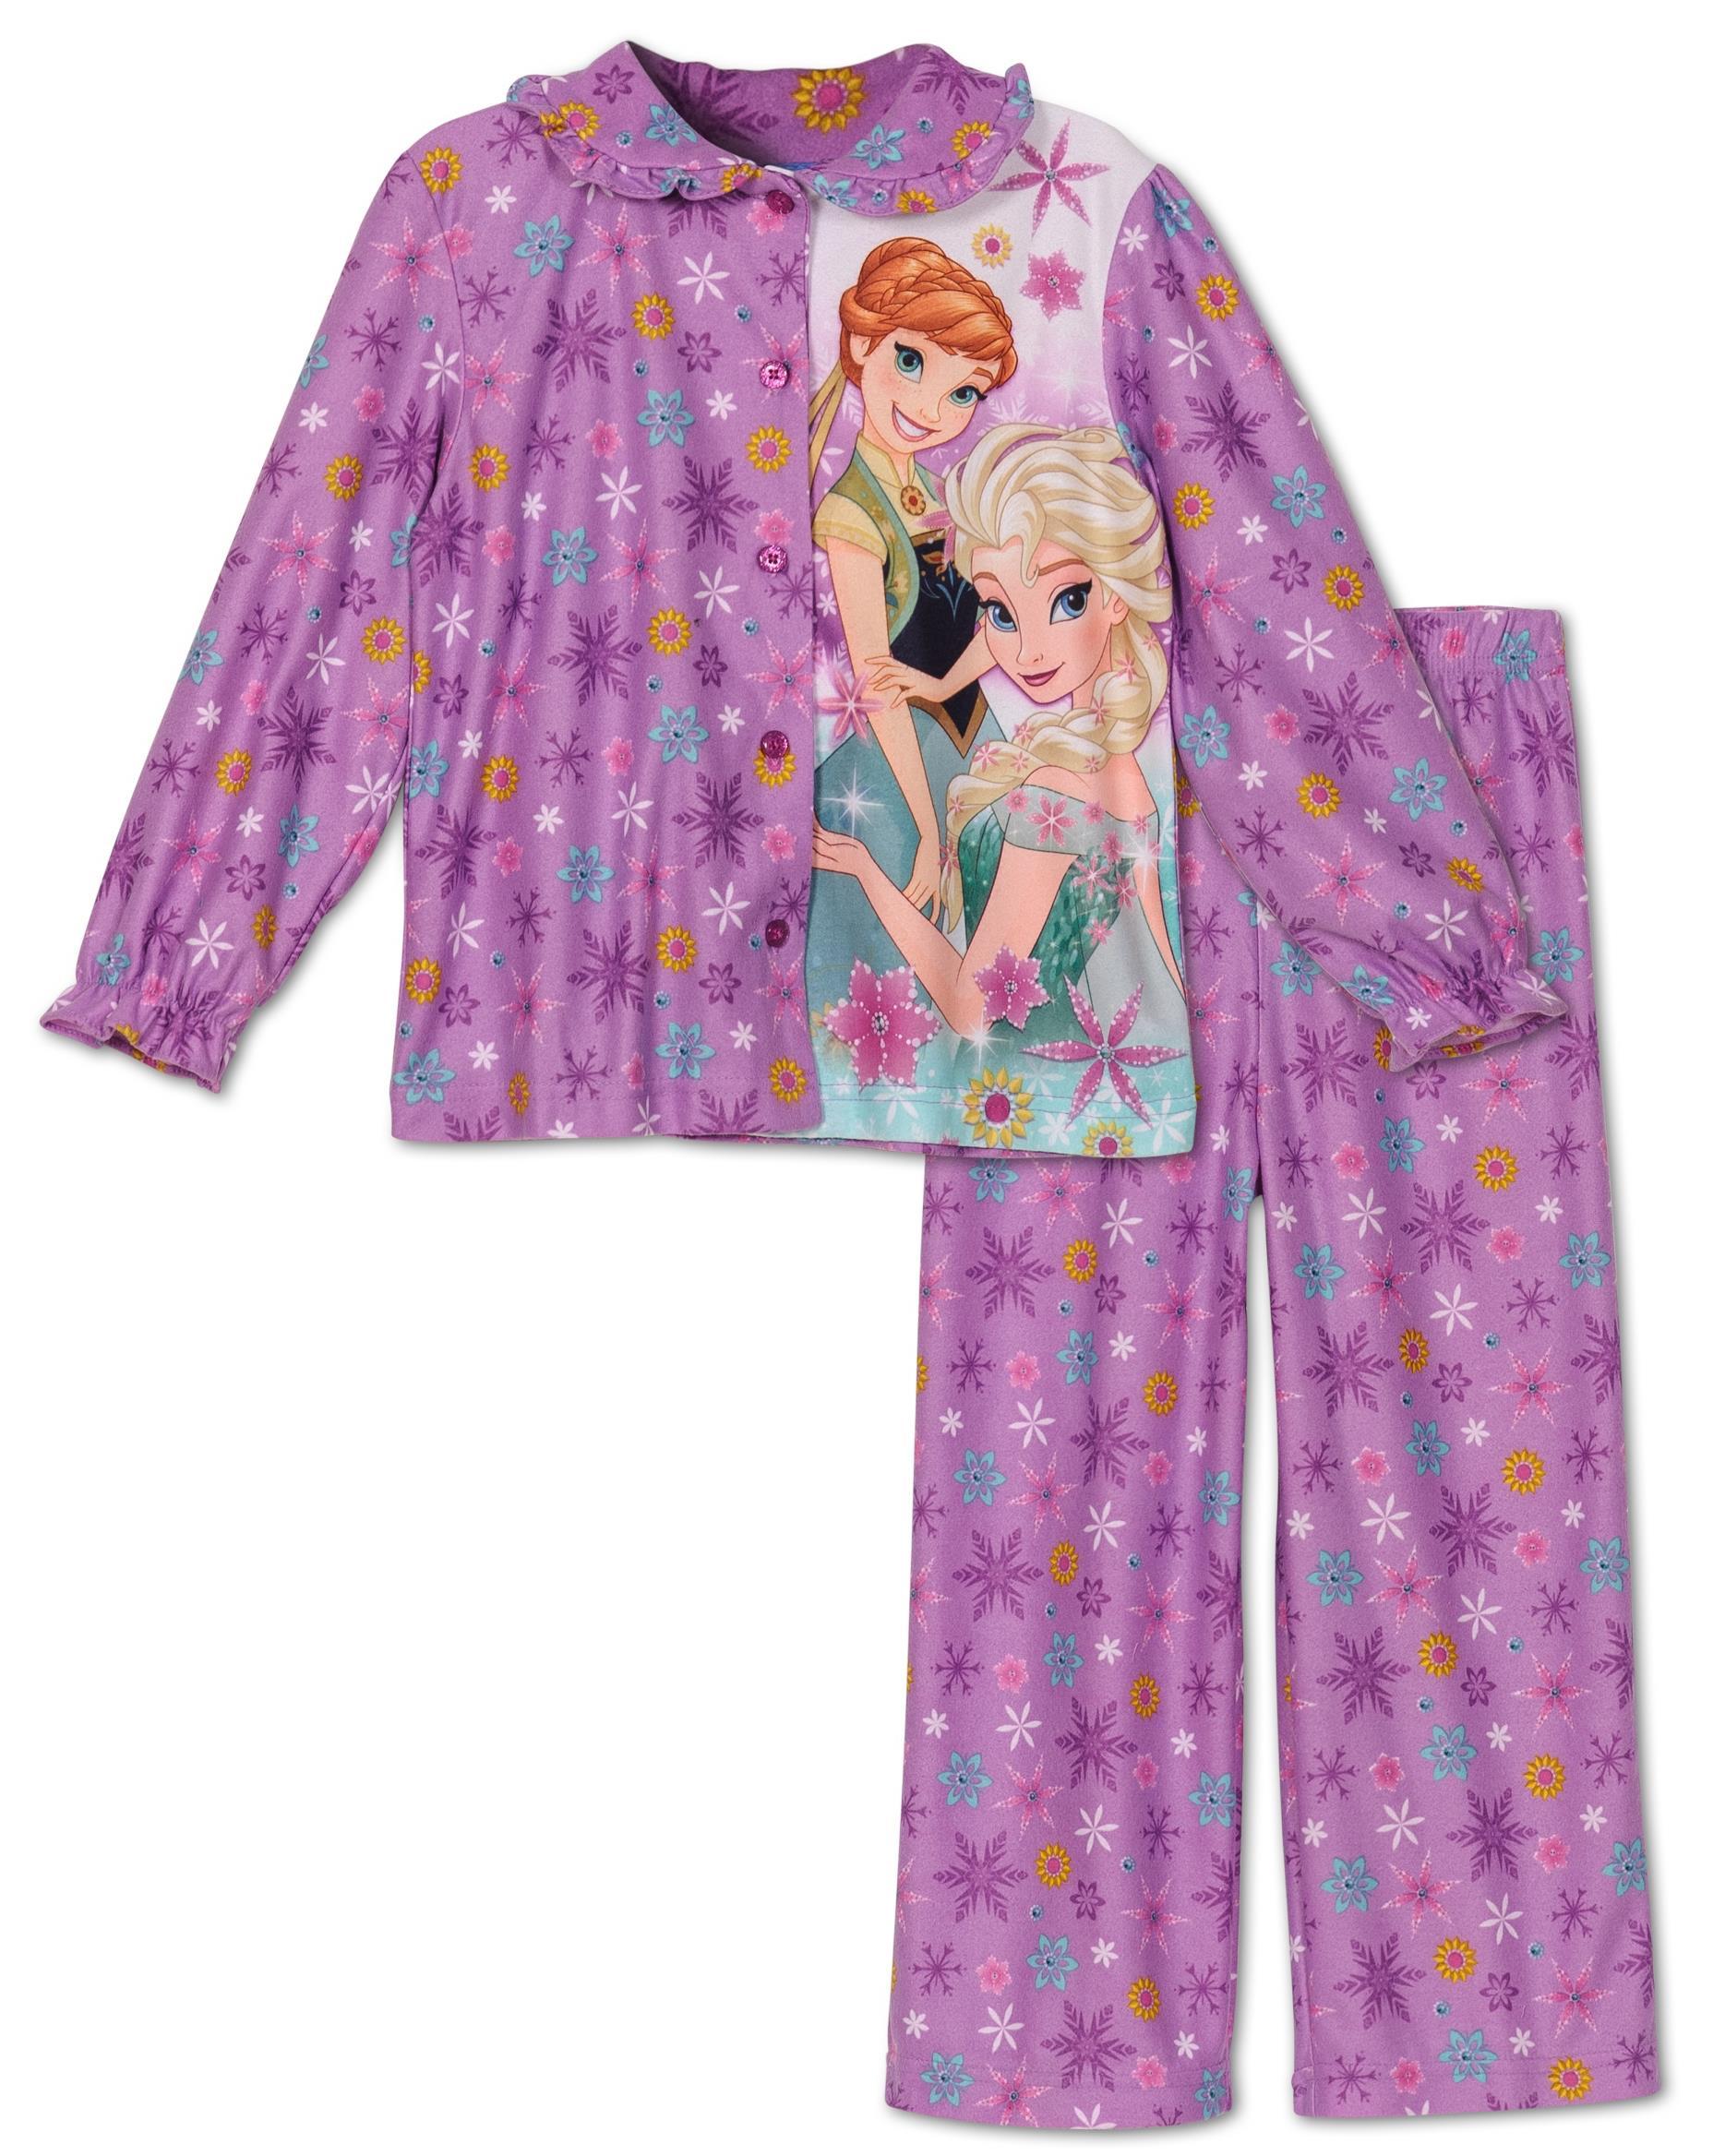 Disney Frozen Toddler Girls Micro Fleece 2 Piece Pajama Set, Sizes 2T-5T